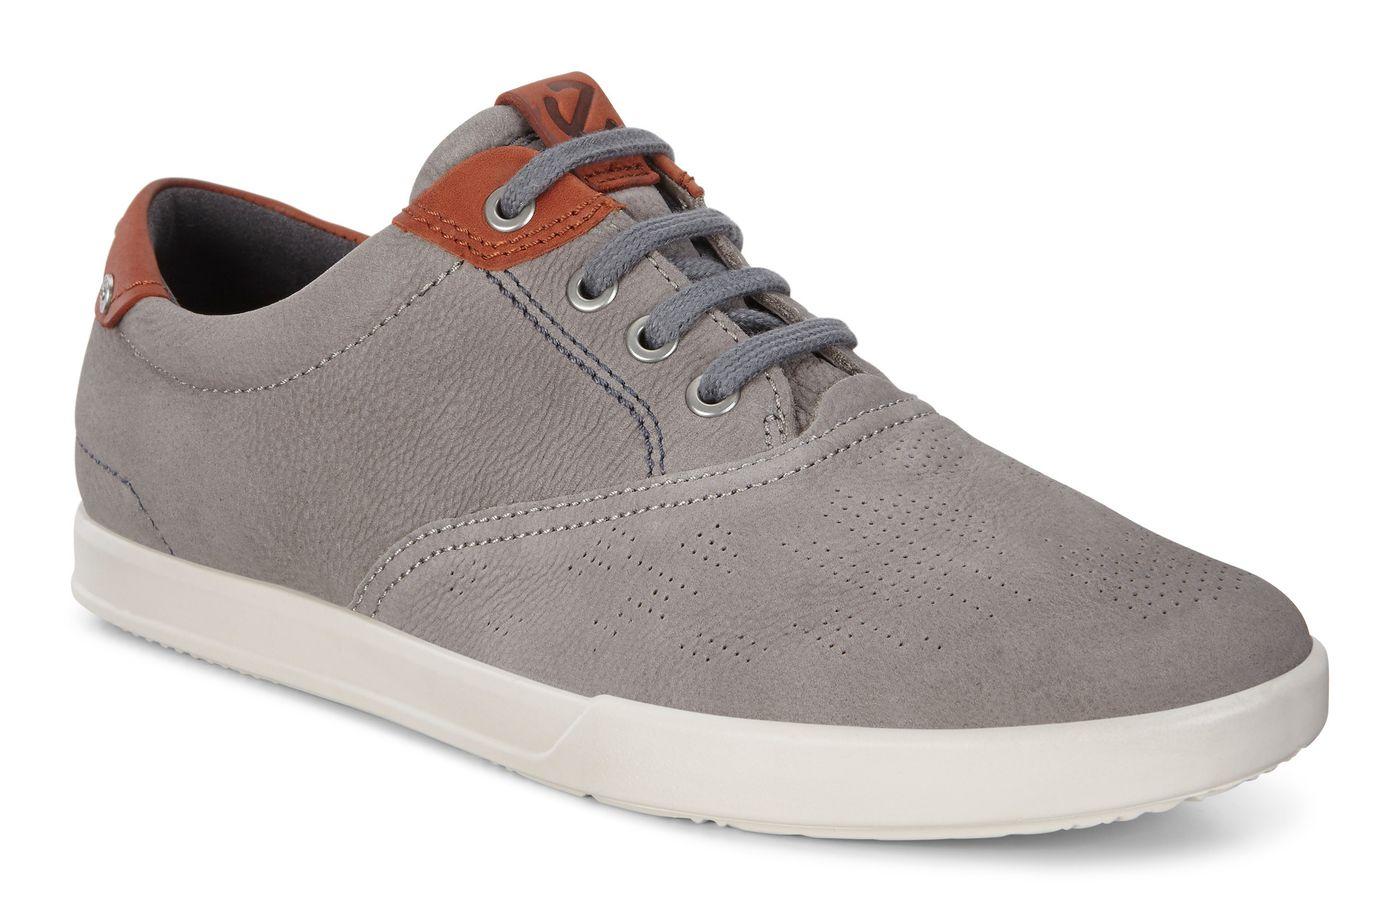 ECCO Collin 2.0 Nubuck Sneaker | Men's